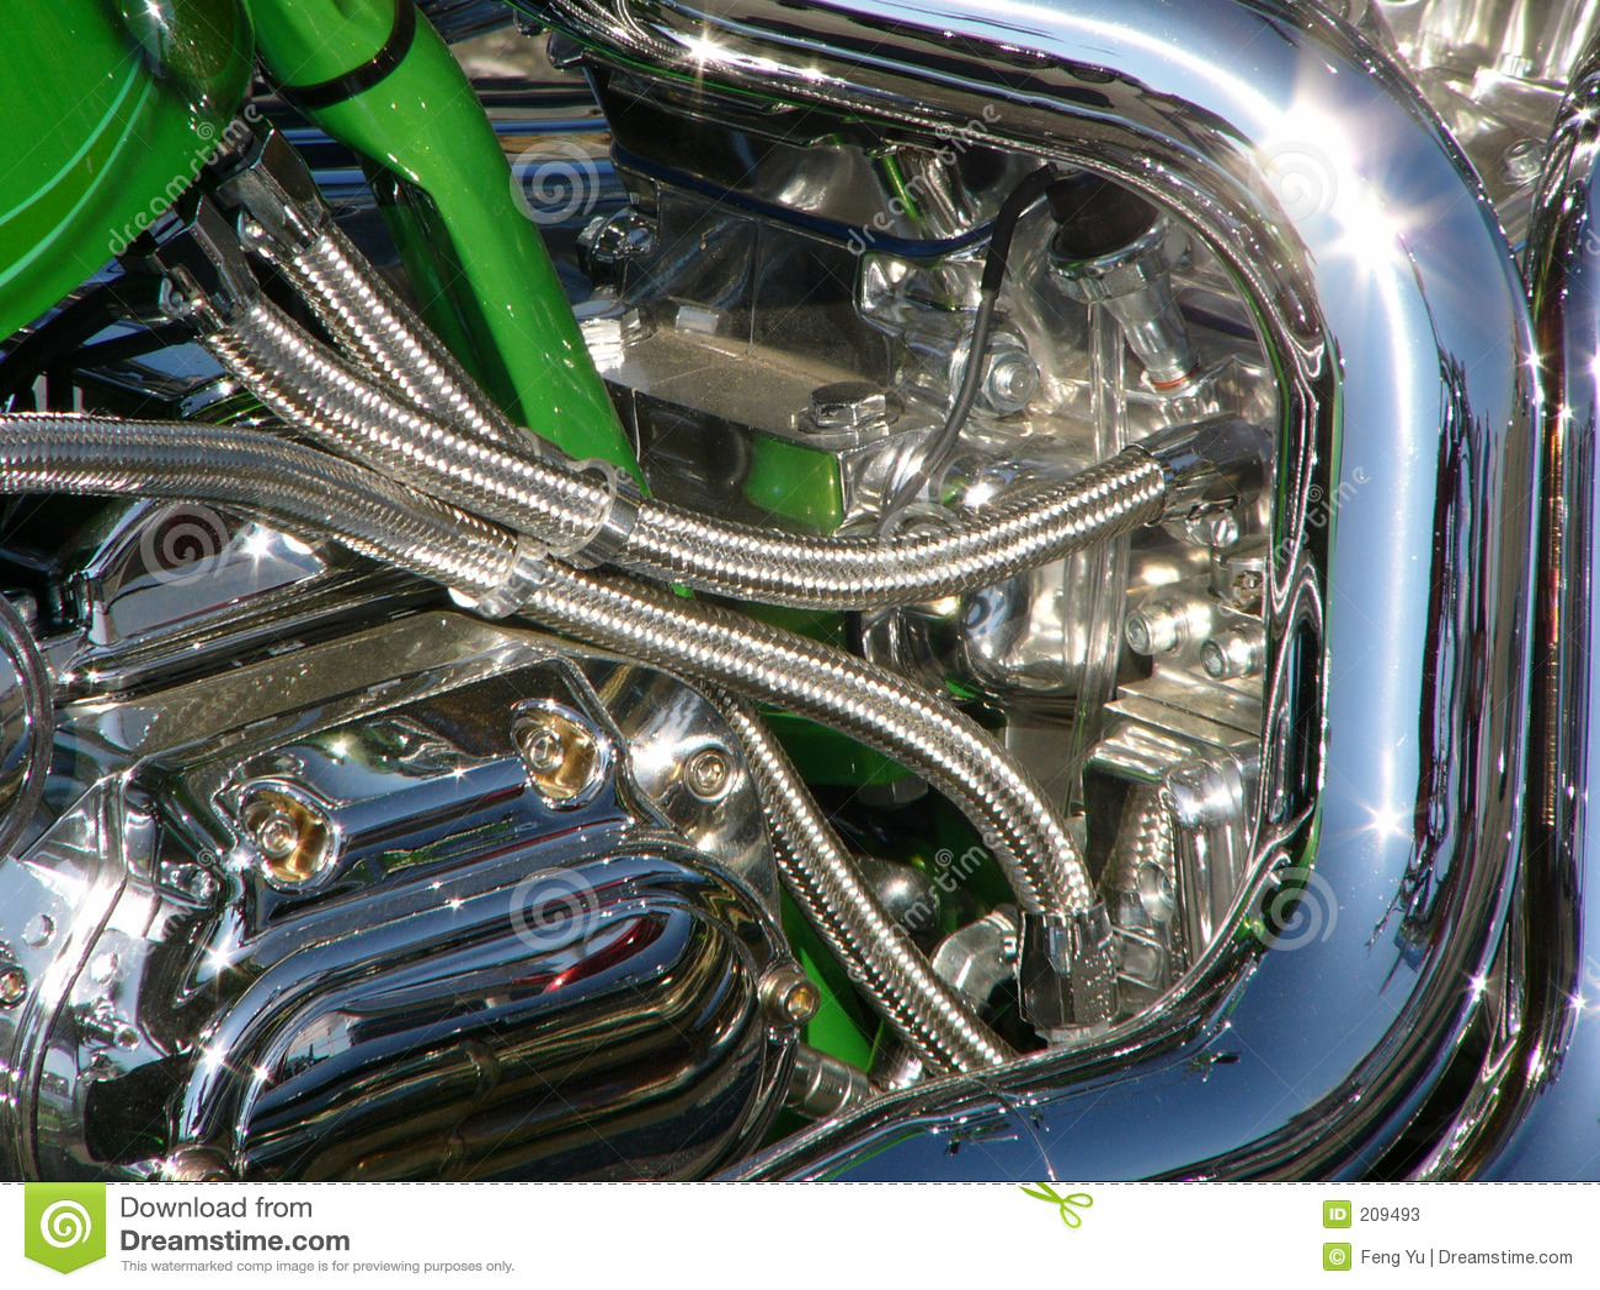 Motormotorcykel